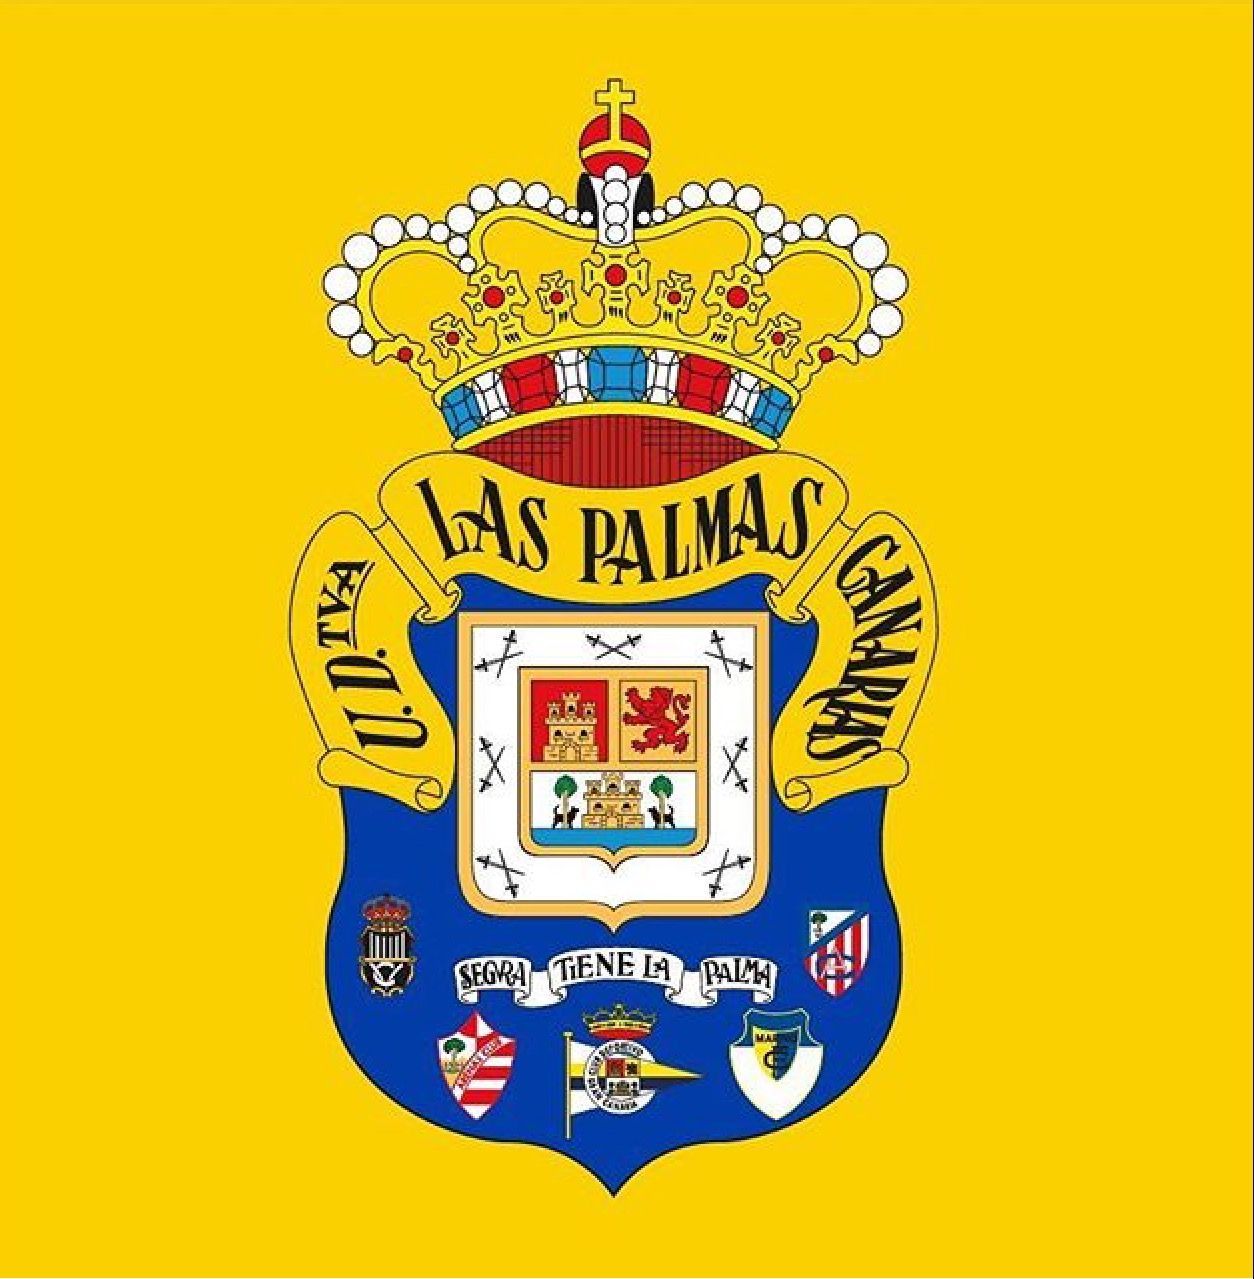 Idea de Alberto en U.D.Las Palmas U.d. las palmas, Las